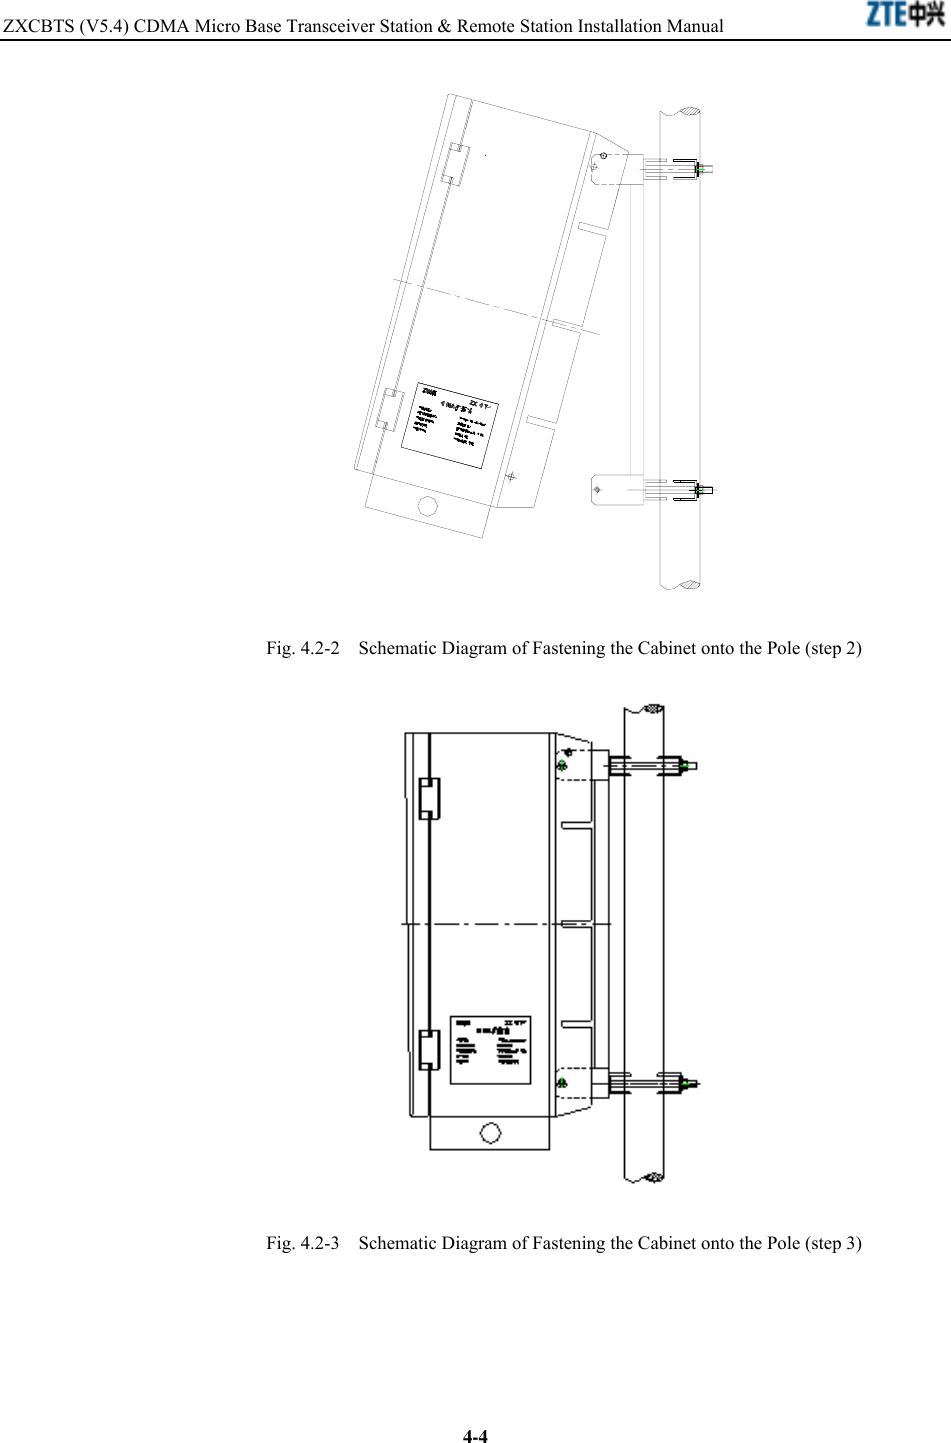 ZTE ZXCBTS192T CDMA Micro Base Transceiver Station User Manual